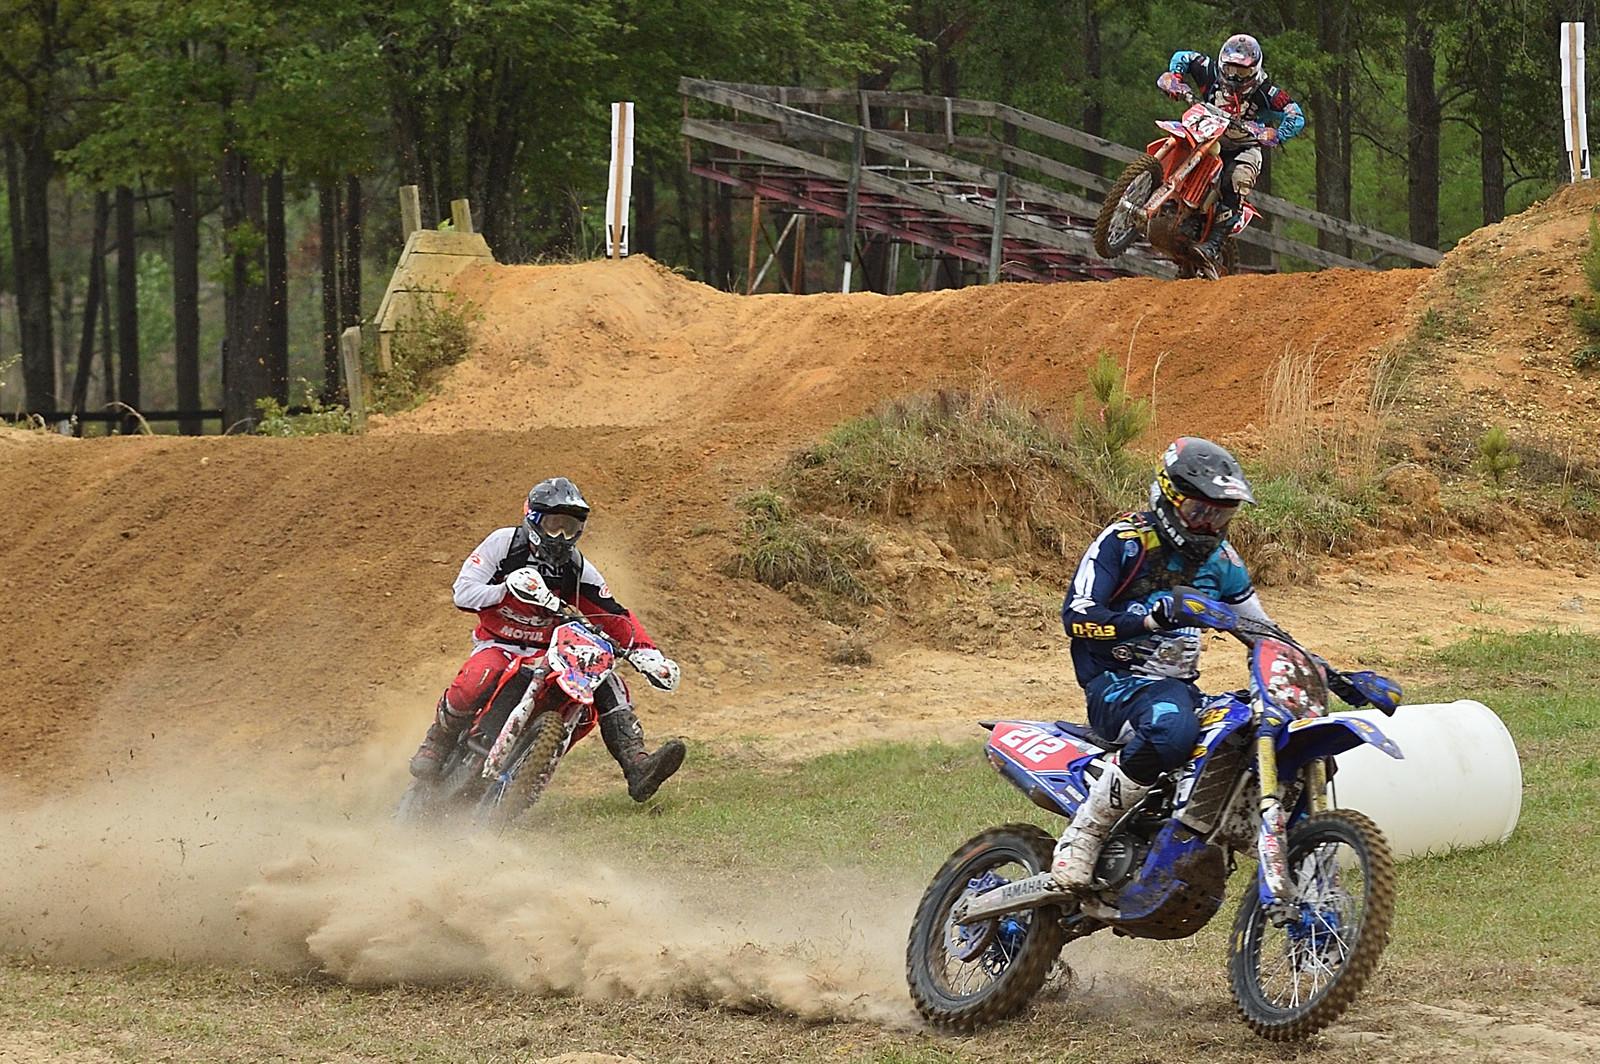 Steward Baylor - GuyB - Motocross Pictures - Vital MX